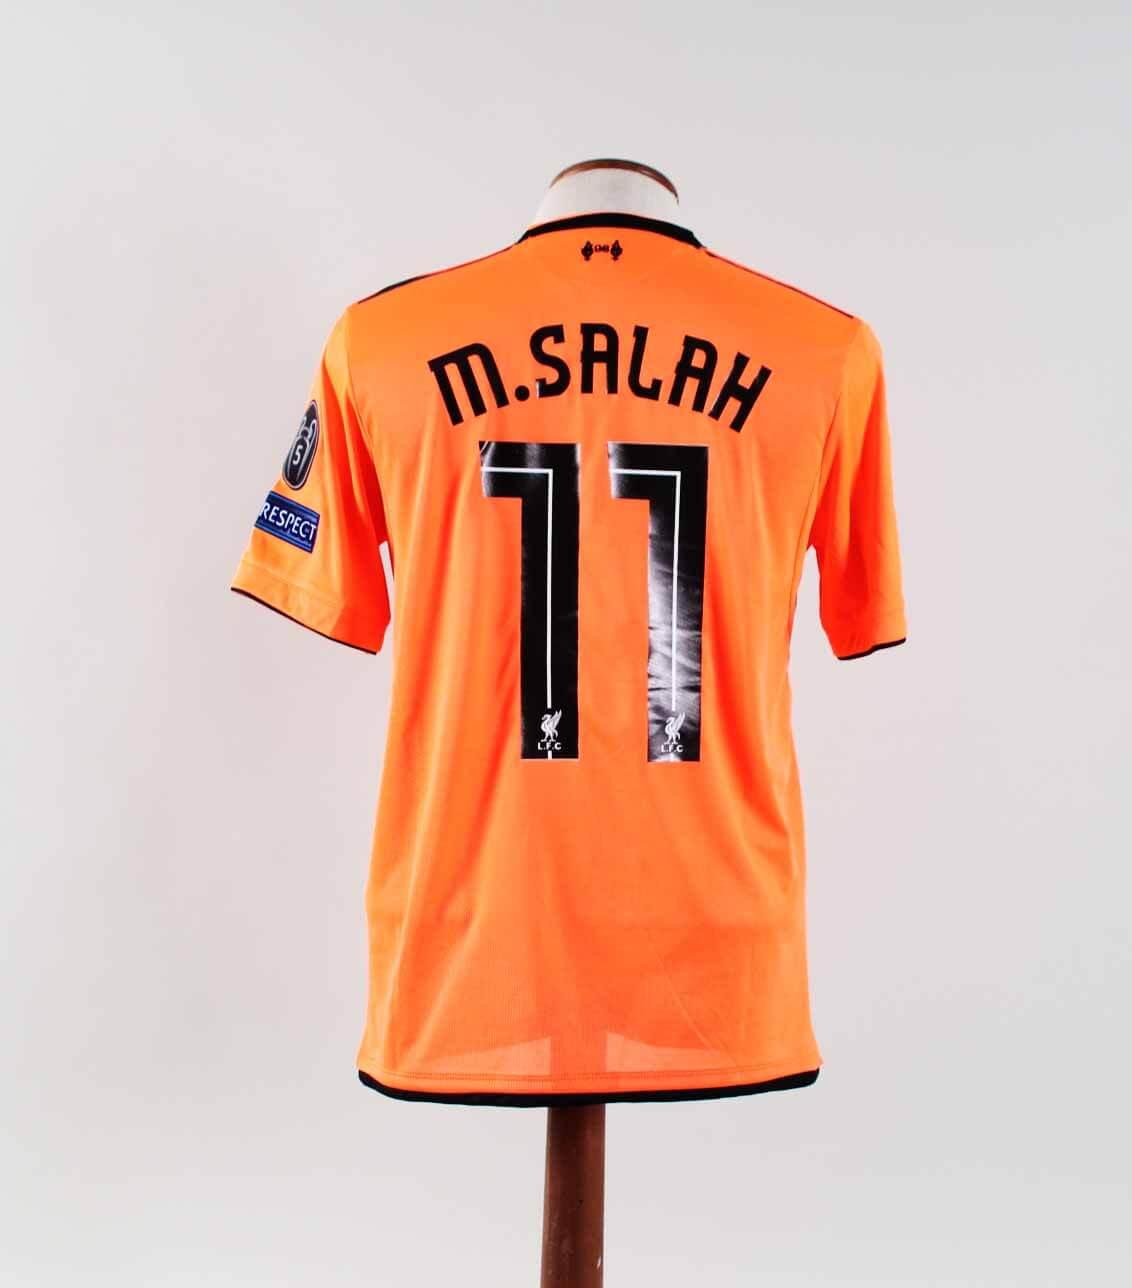 best service 899a9 9bd71 Mohamed Salah Game-Worn Jersey Liverpool F.C.